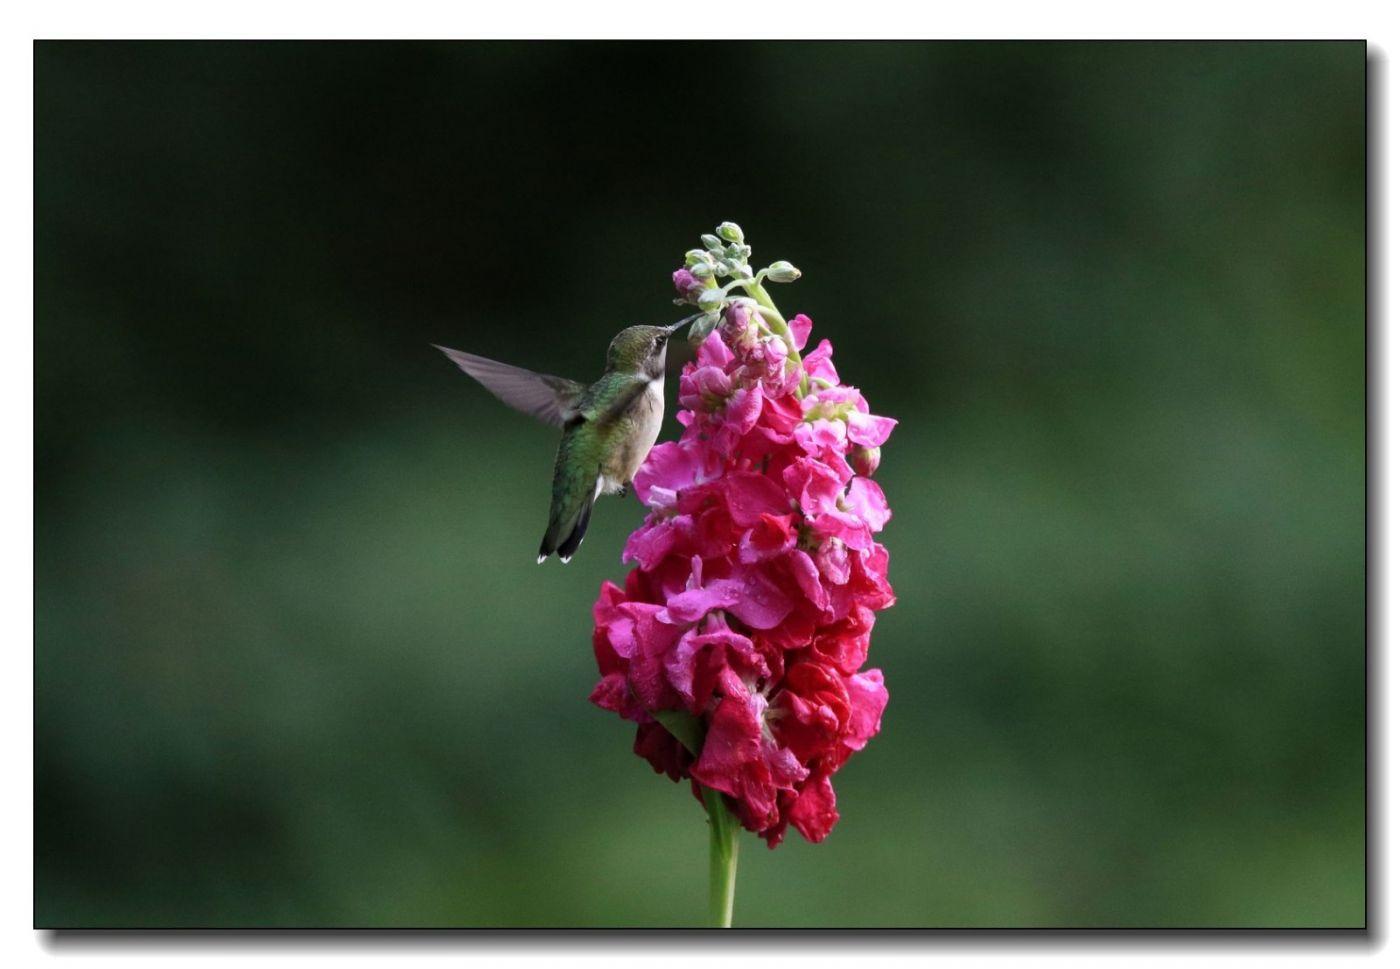 蜂鸟组图(一)_图1-2